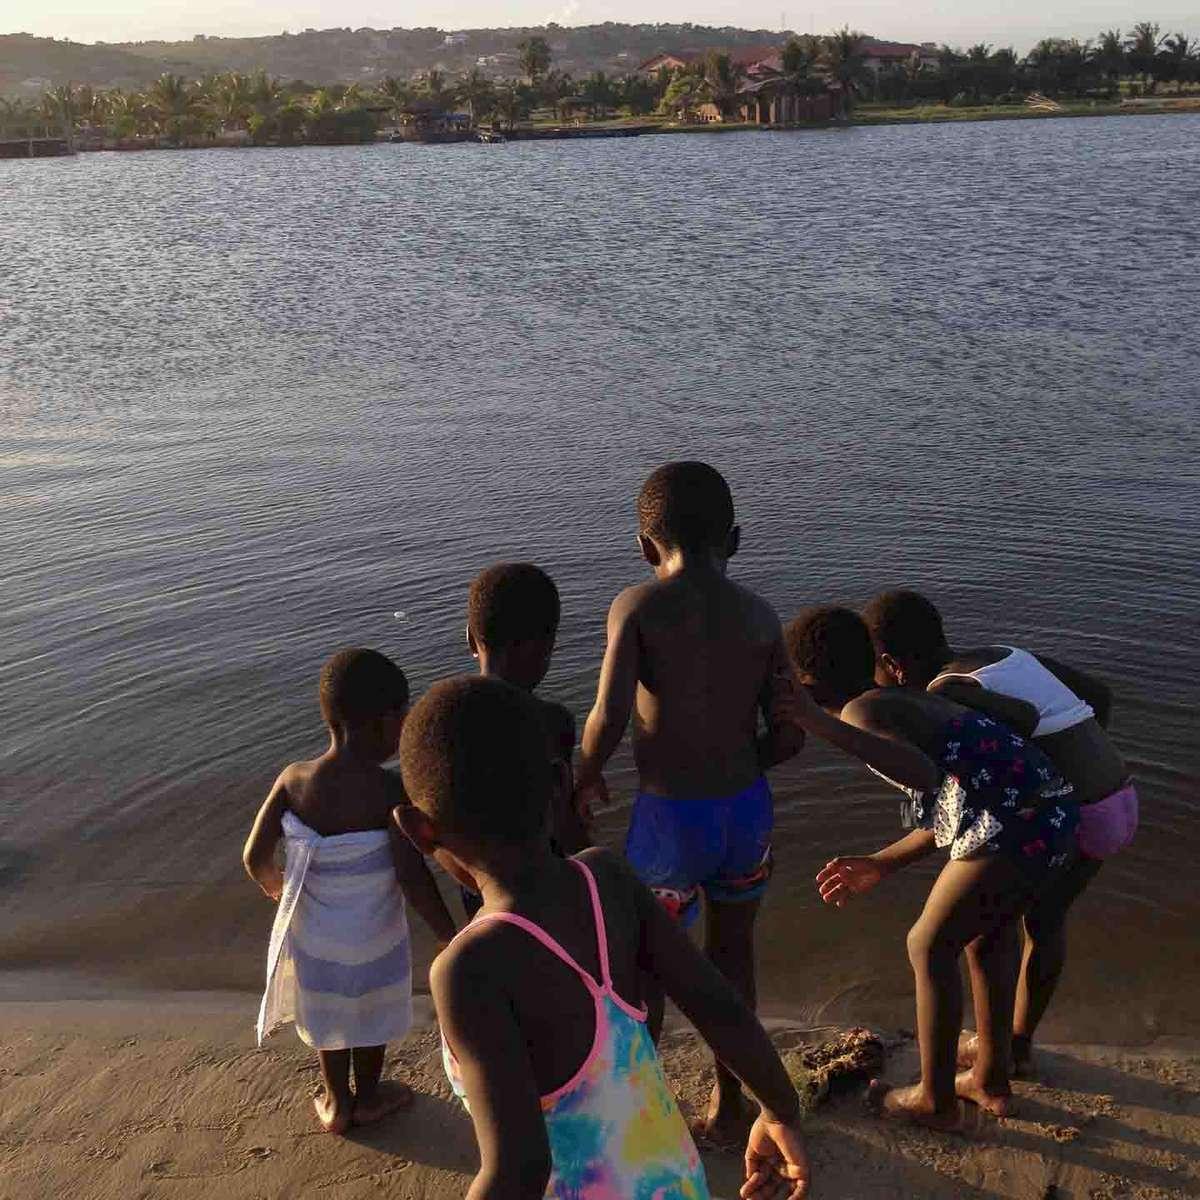 Something in the water. Bojo Beach, Accra, Ghana. May 2014.